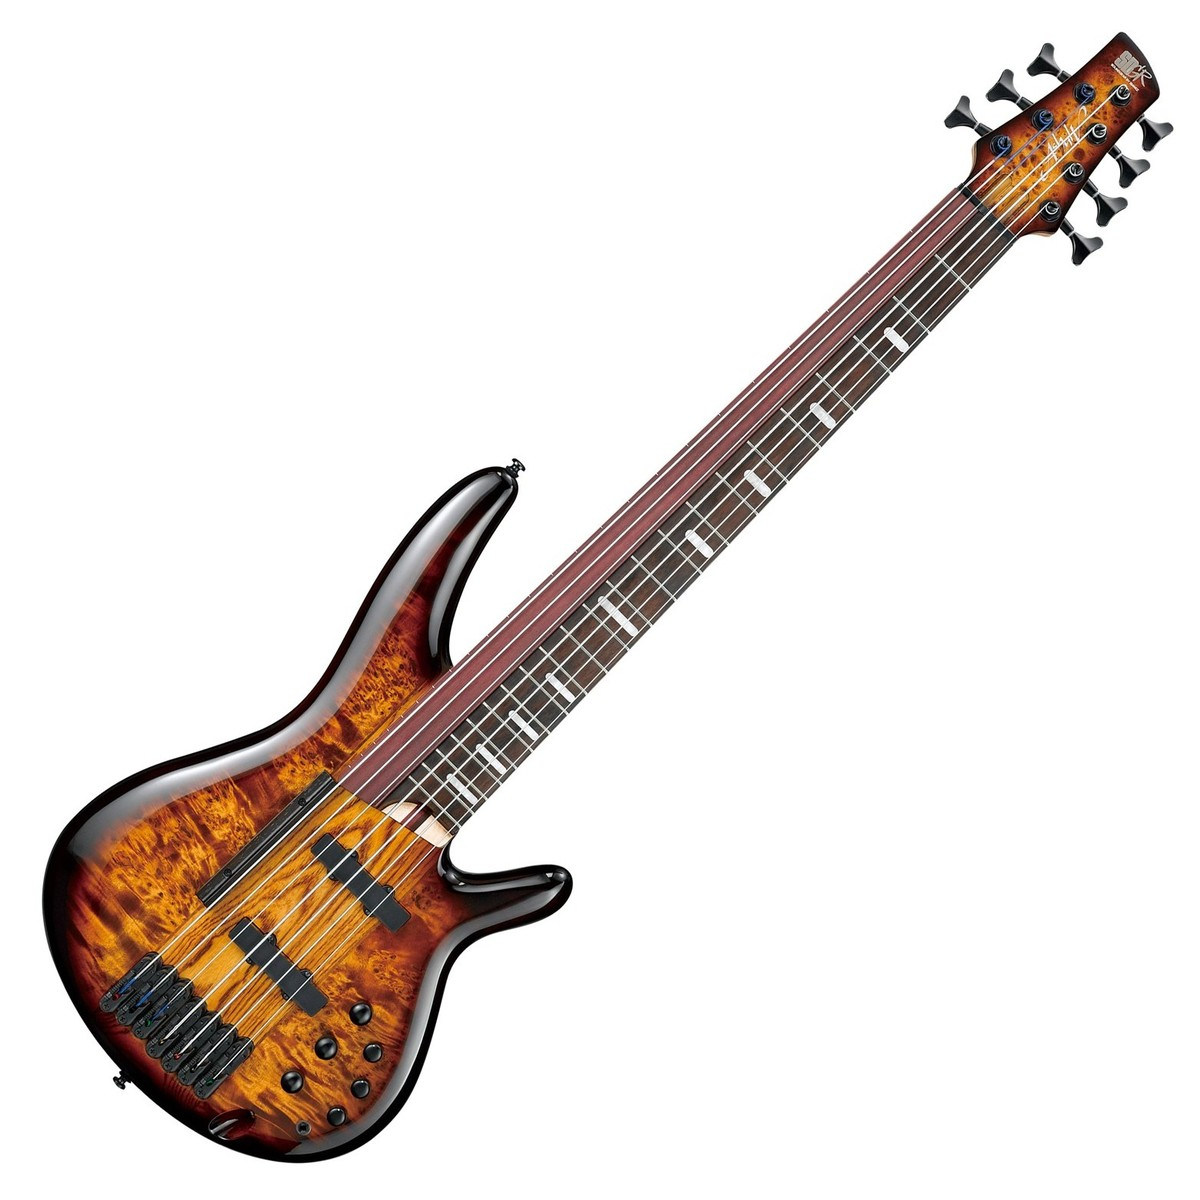 ibanez sras7 7 string fretted fretless bass guitar at. Black Bedroom Furniture Sets. Home Design Ideas